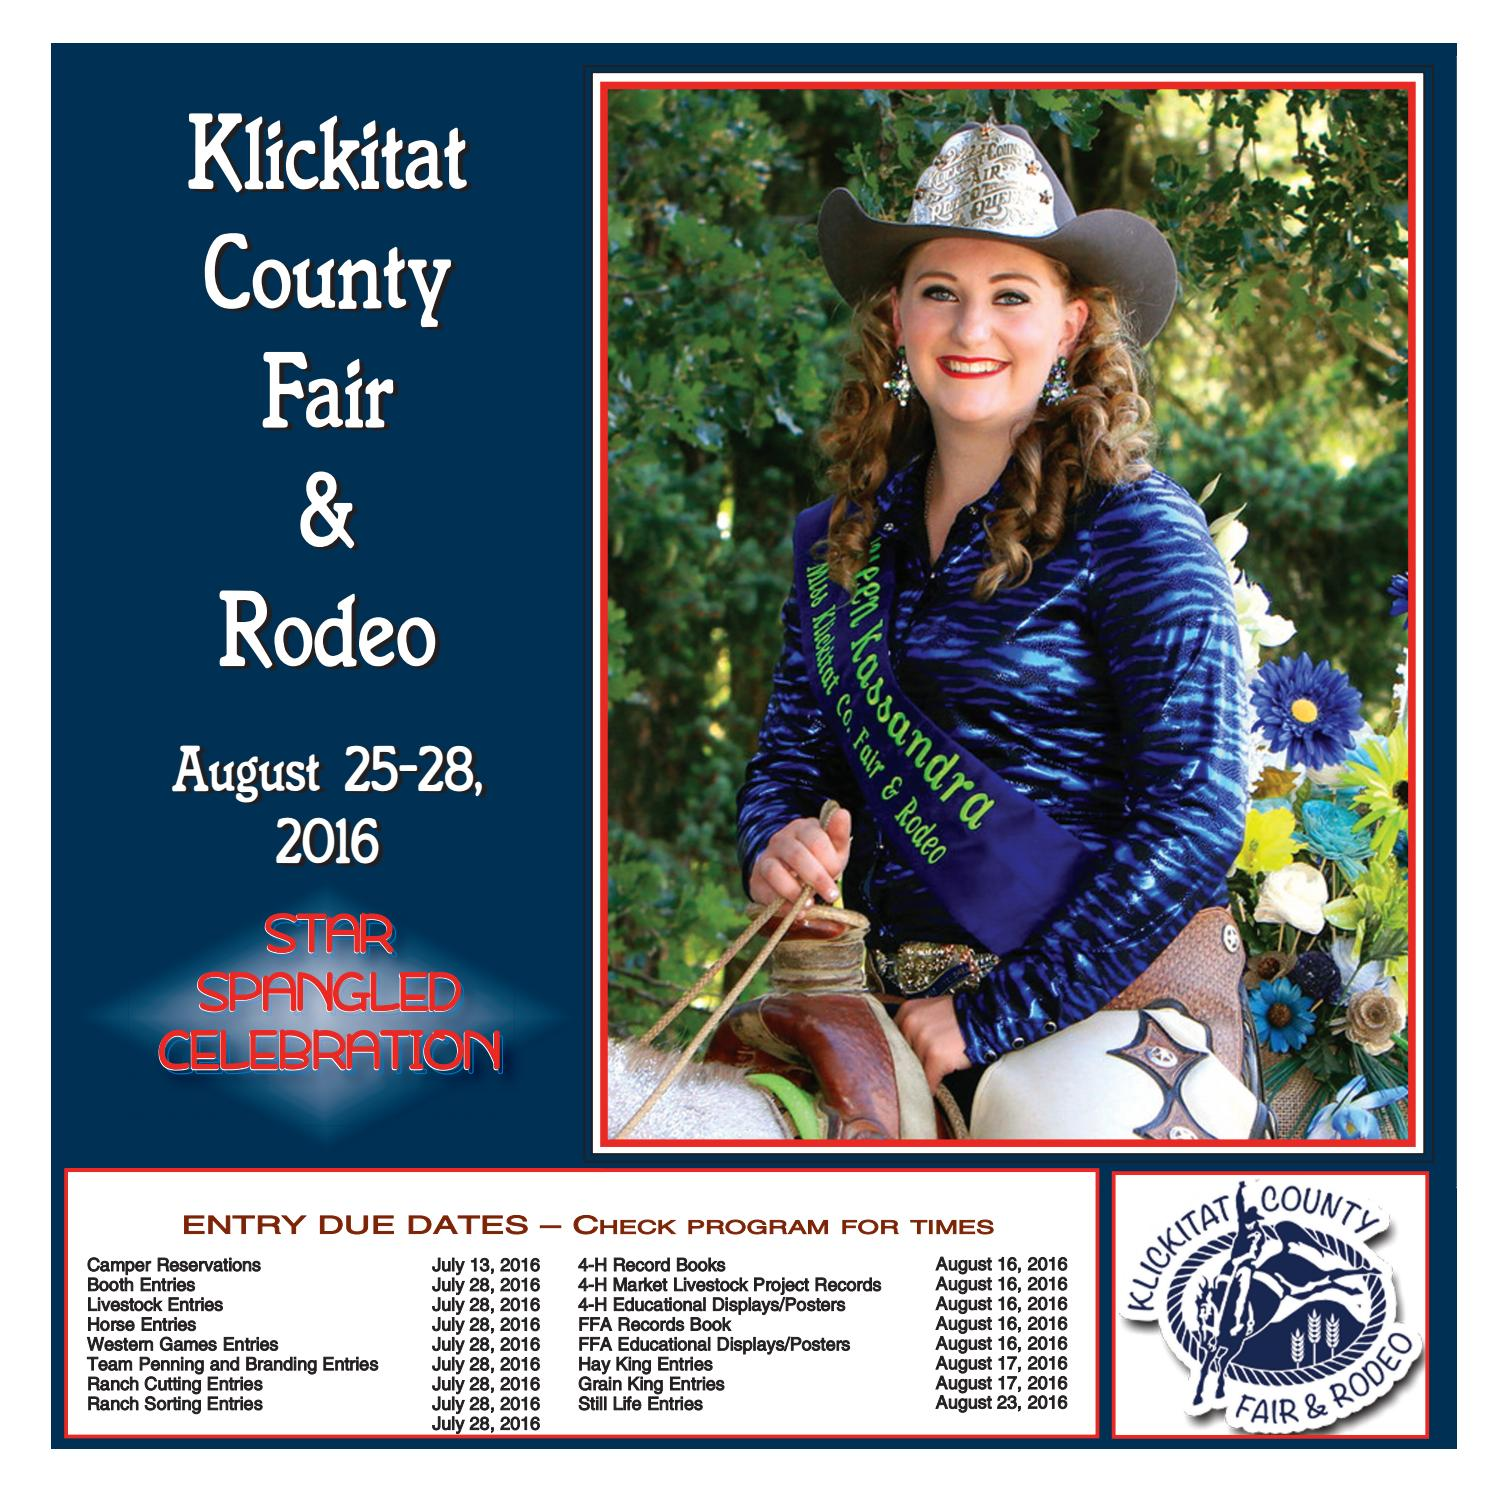 2016 Klickitat County Fair Premium Book By Goldendale